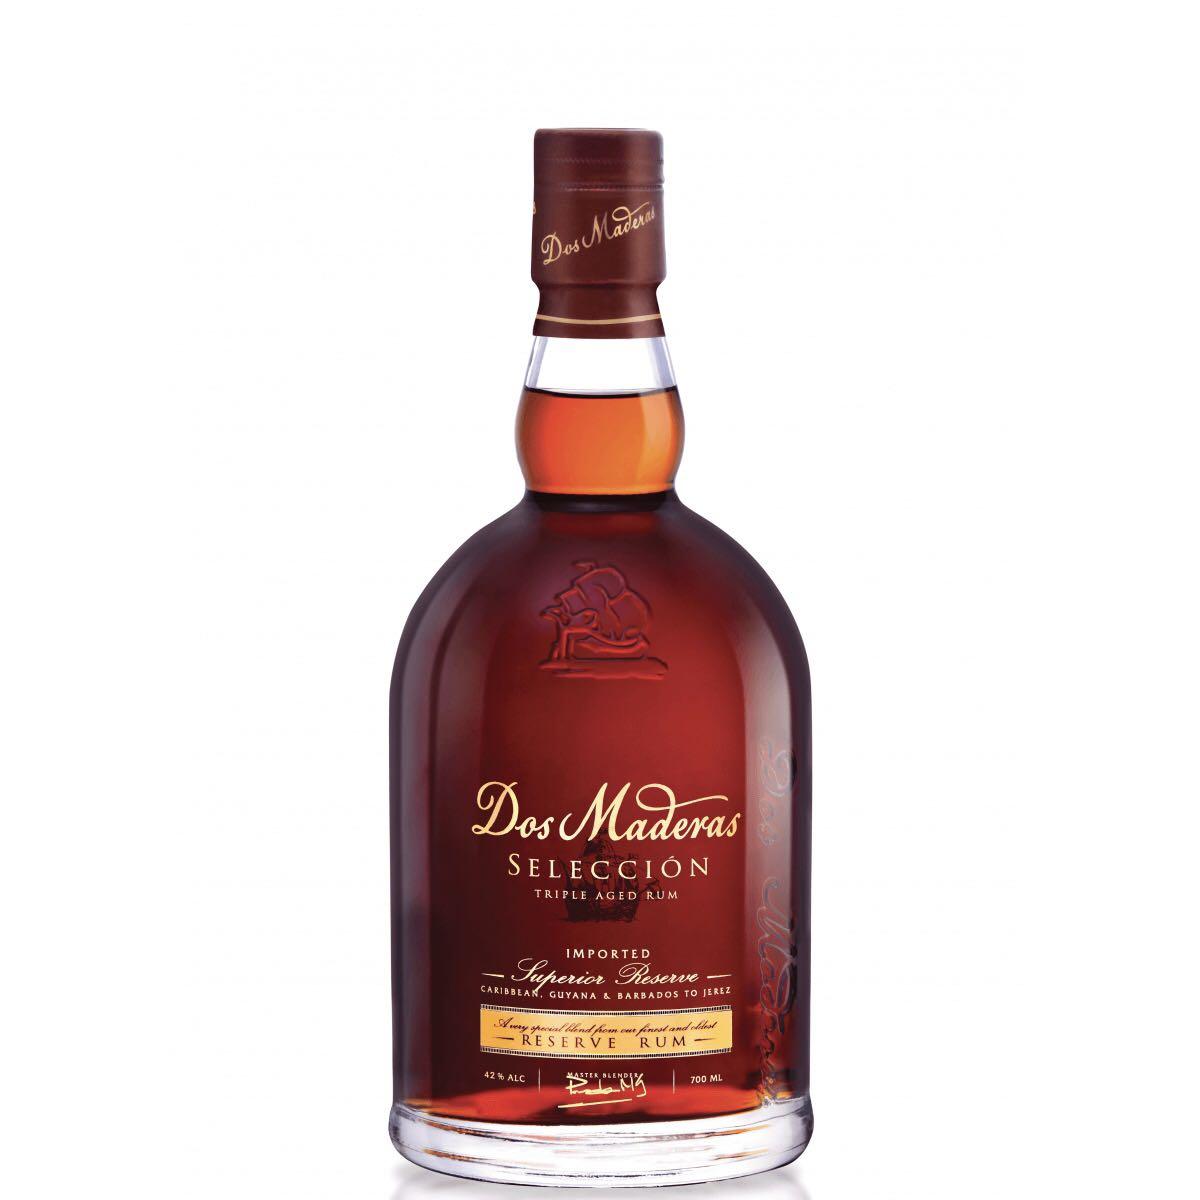 Bottle image of Dos Maderas Seleccion